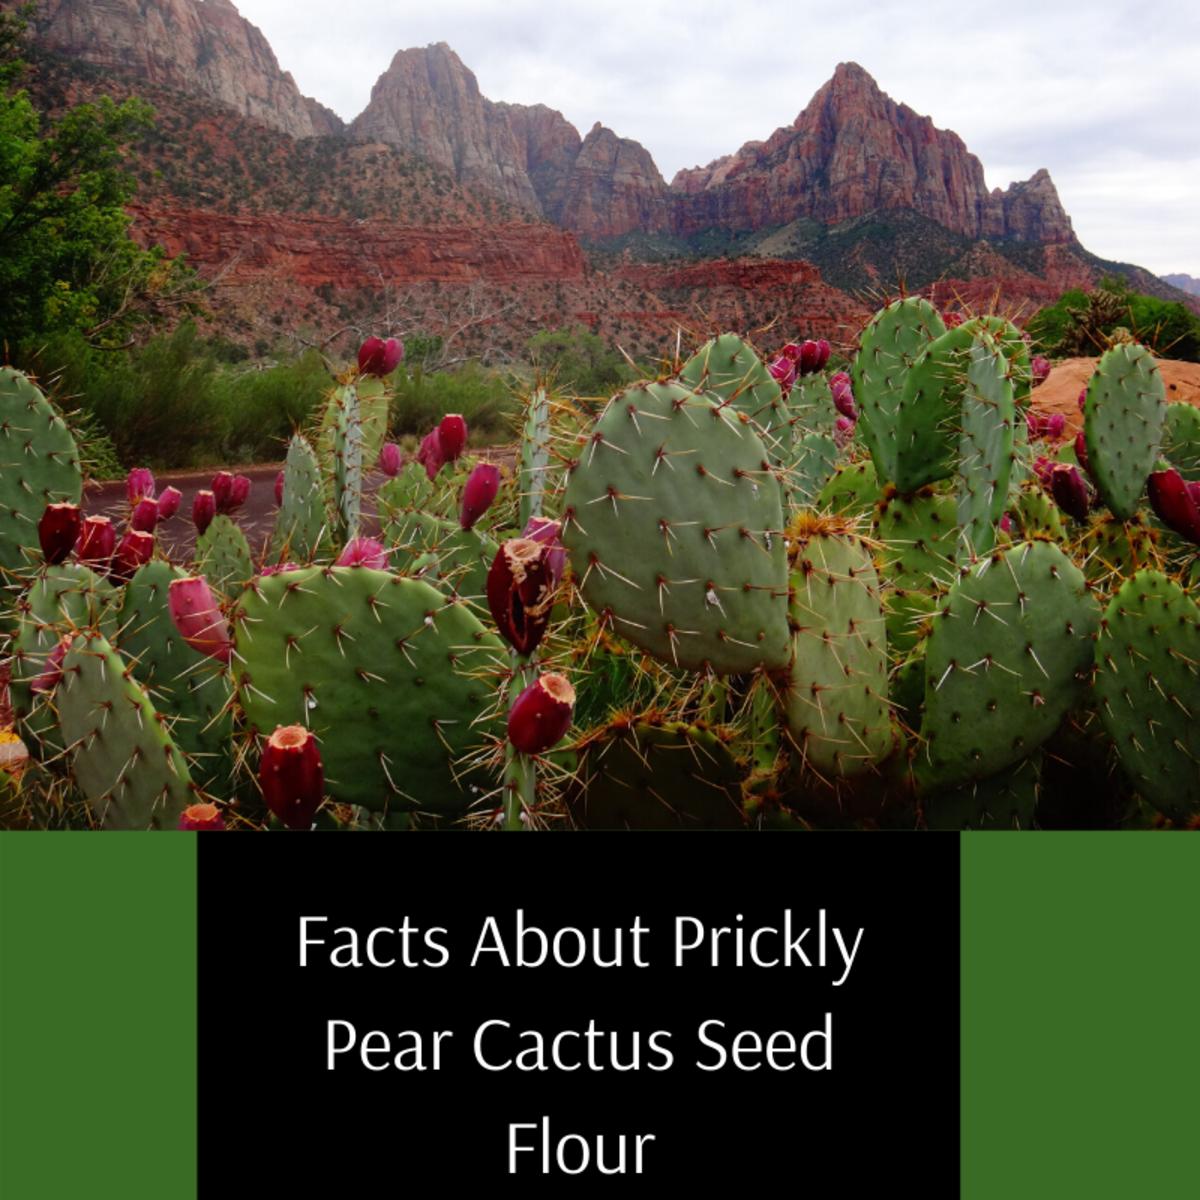 Prickly Pear Cactus Seed Flour